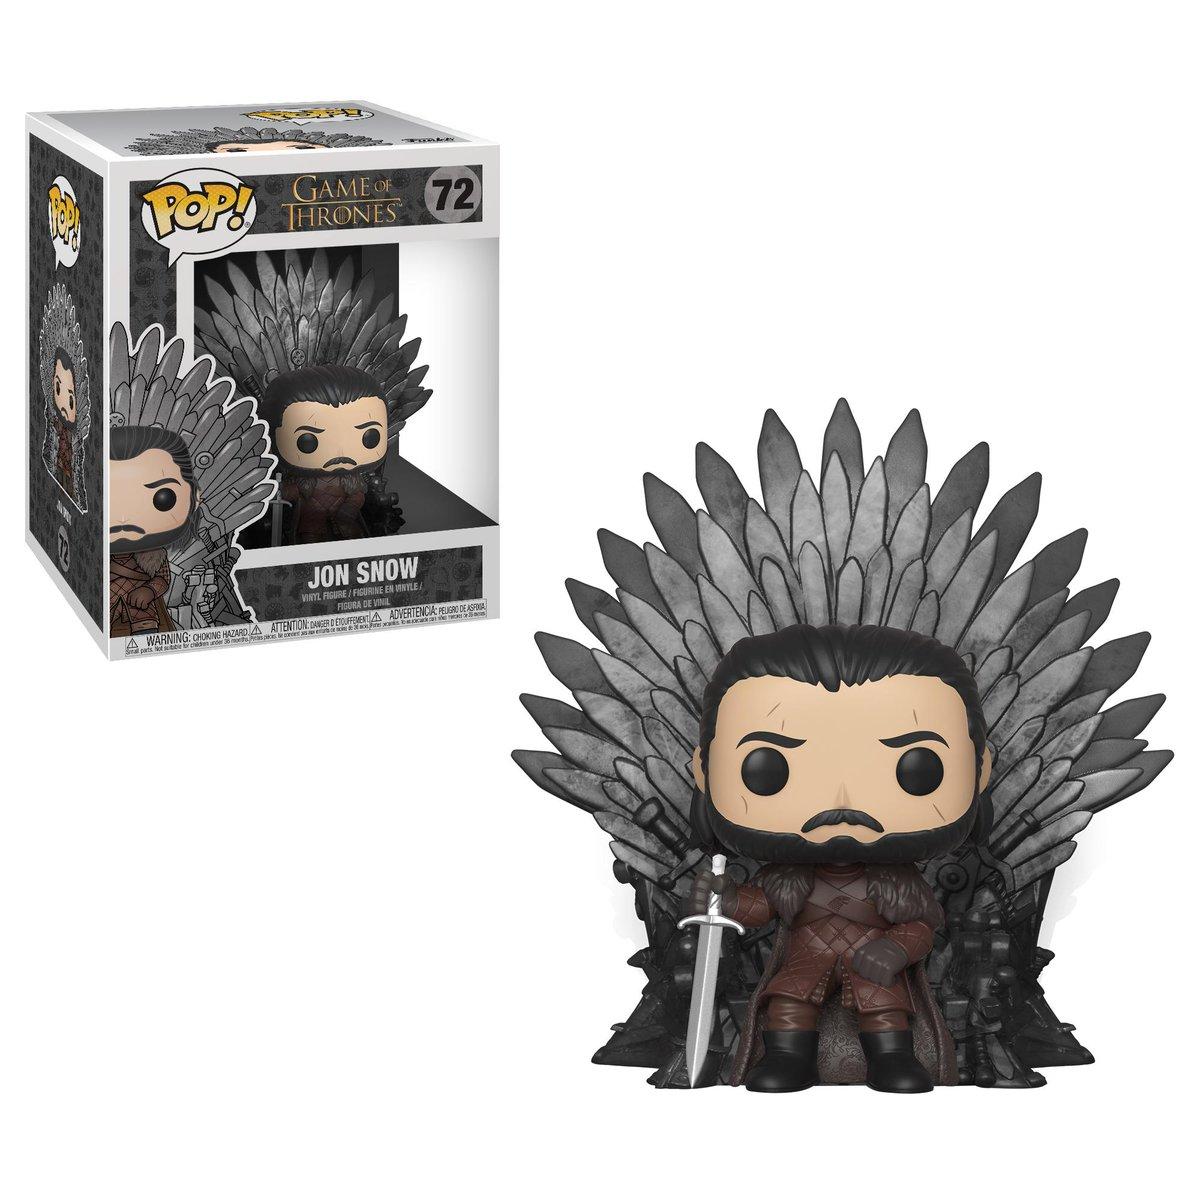 RT & follow @OriginalFunko for a chance to win a Jon Snow on Iron Throne Pop! #GameofThrones #ForTheThrone #GOT #JonSnow